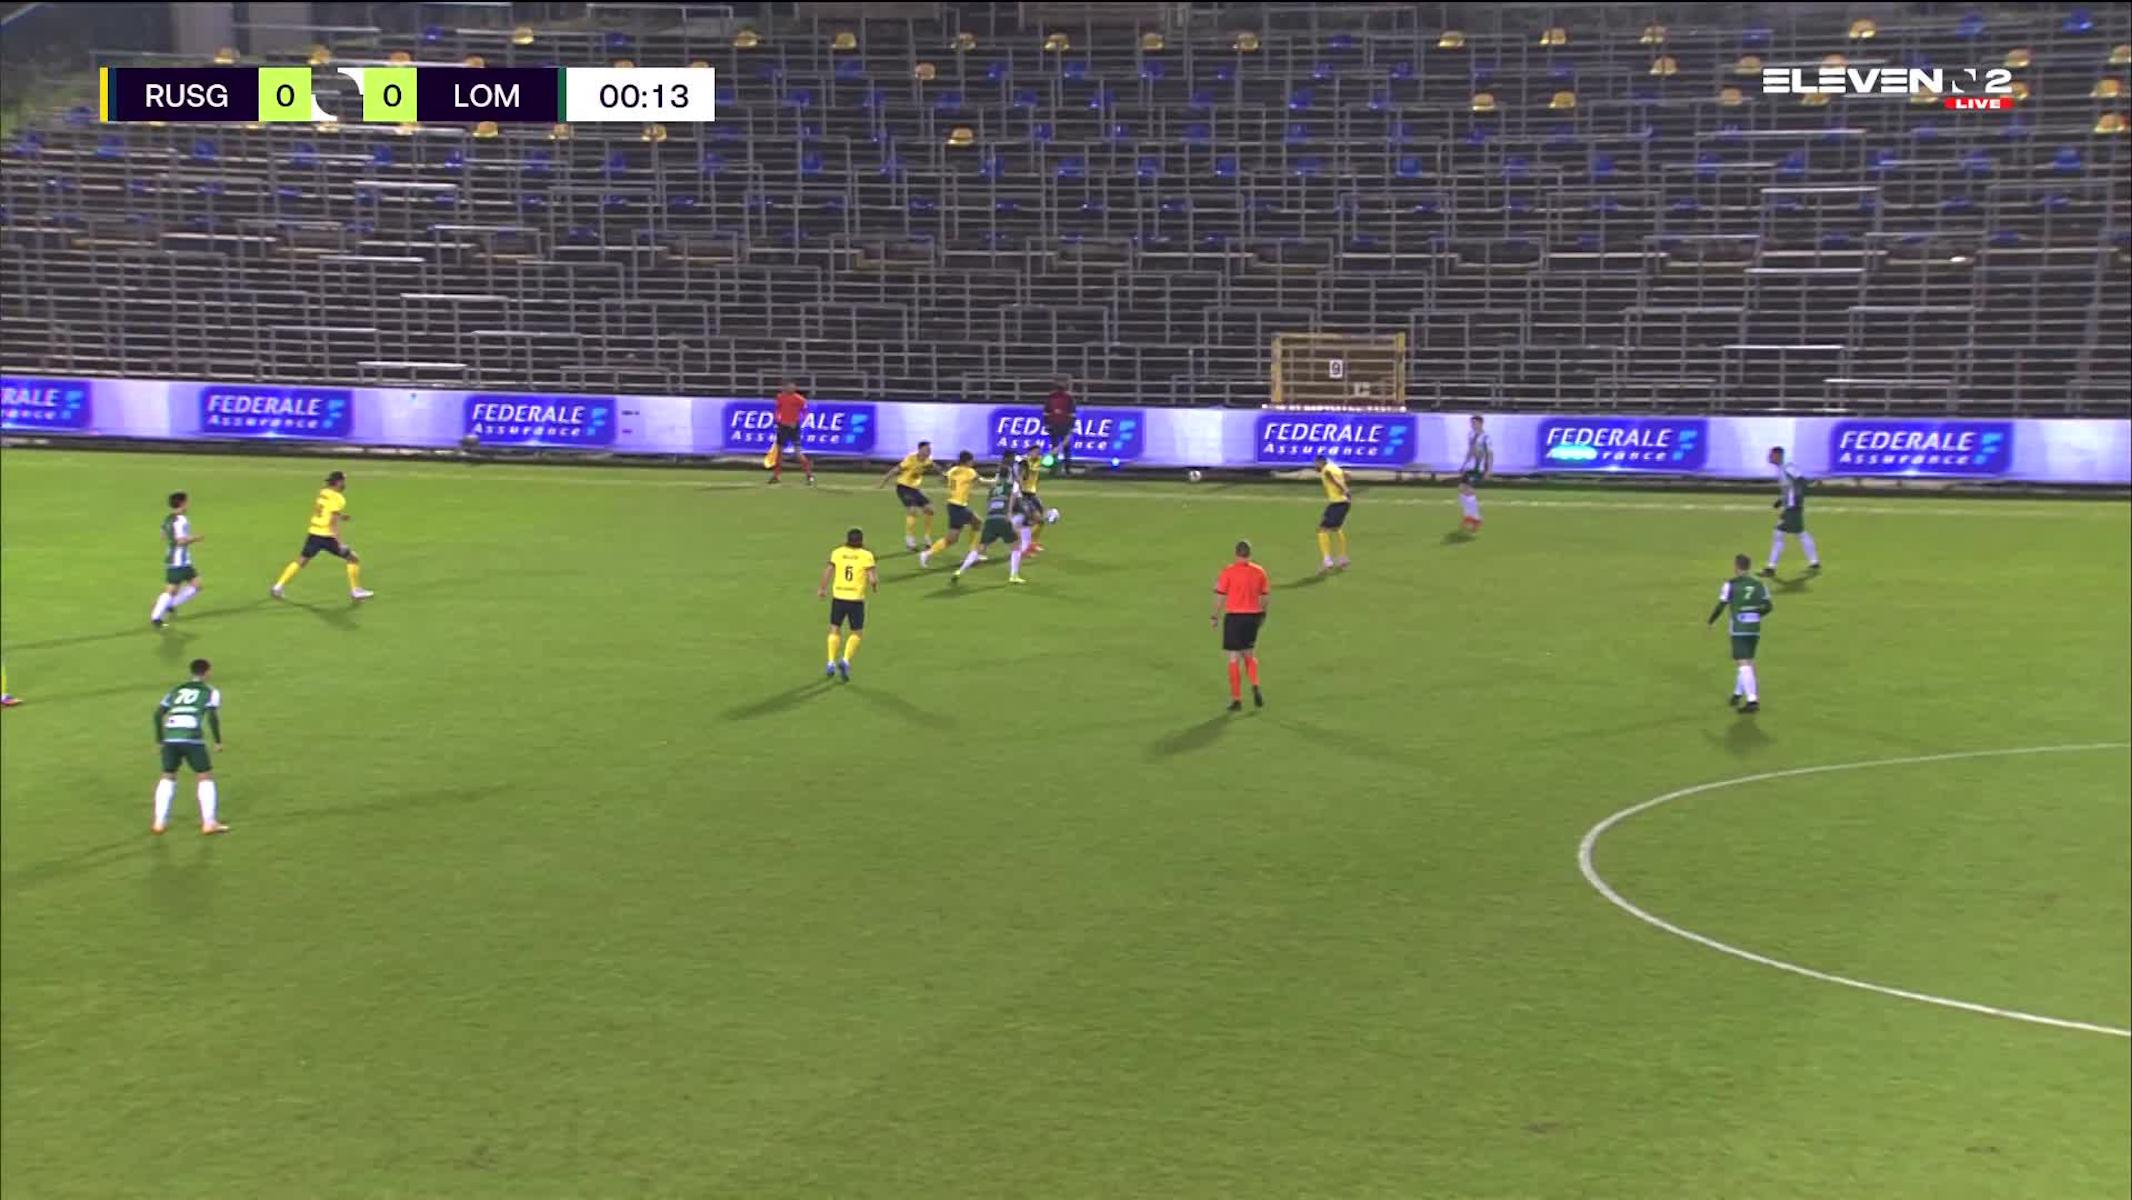 But Arno Verschueren (Royale Union Saint-Gilloise vs. Lommel SK)